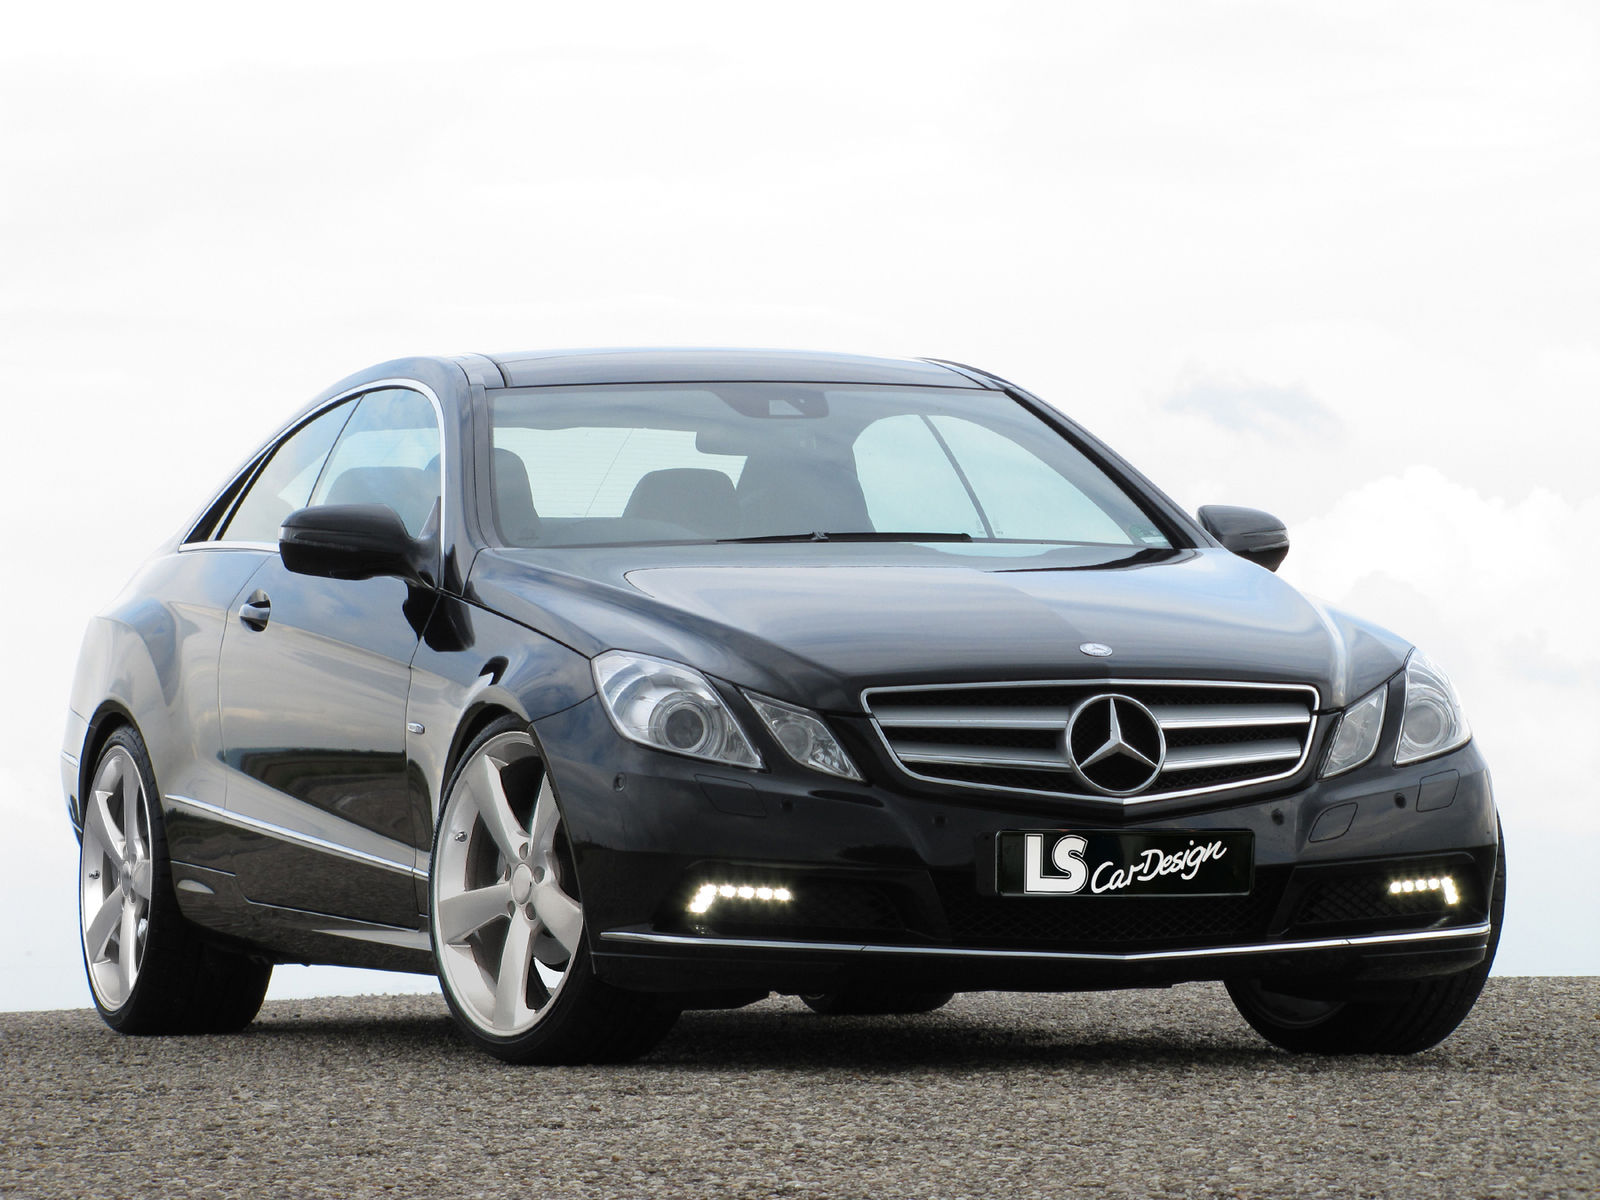 News Alufelgen Neu Mercedes E Klasse Coupe W207 19zoll Und